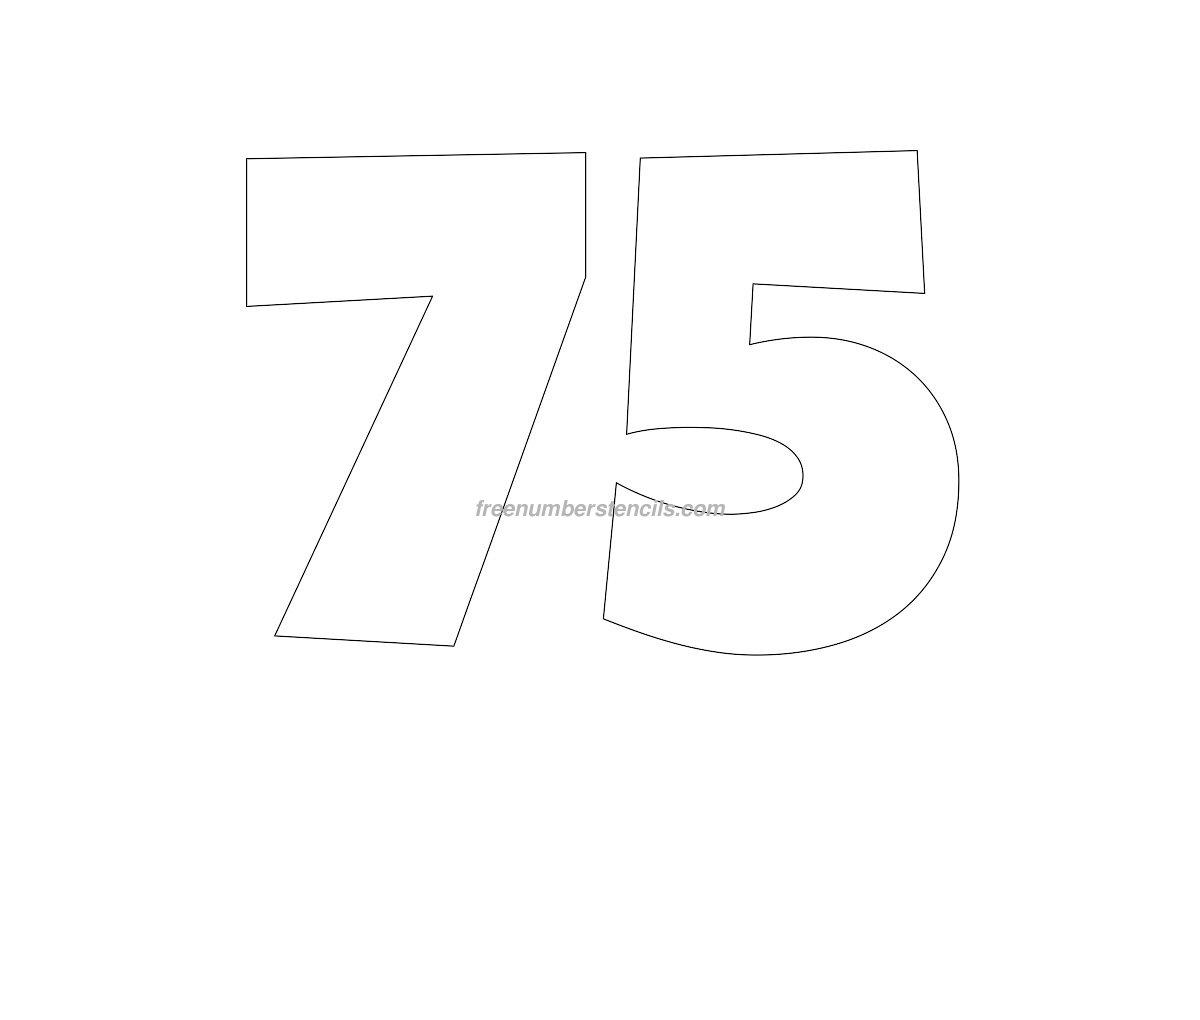 Free Giant 75 Number Stencil - Freenumberstencils.com